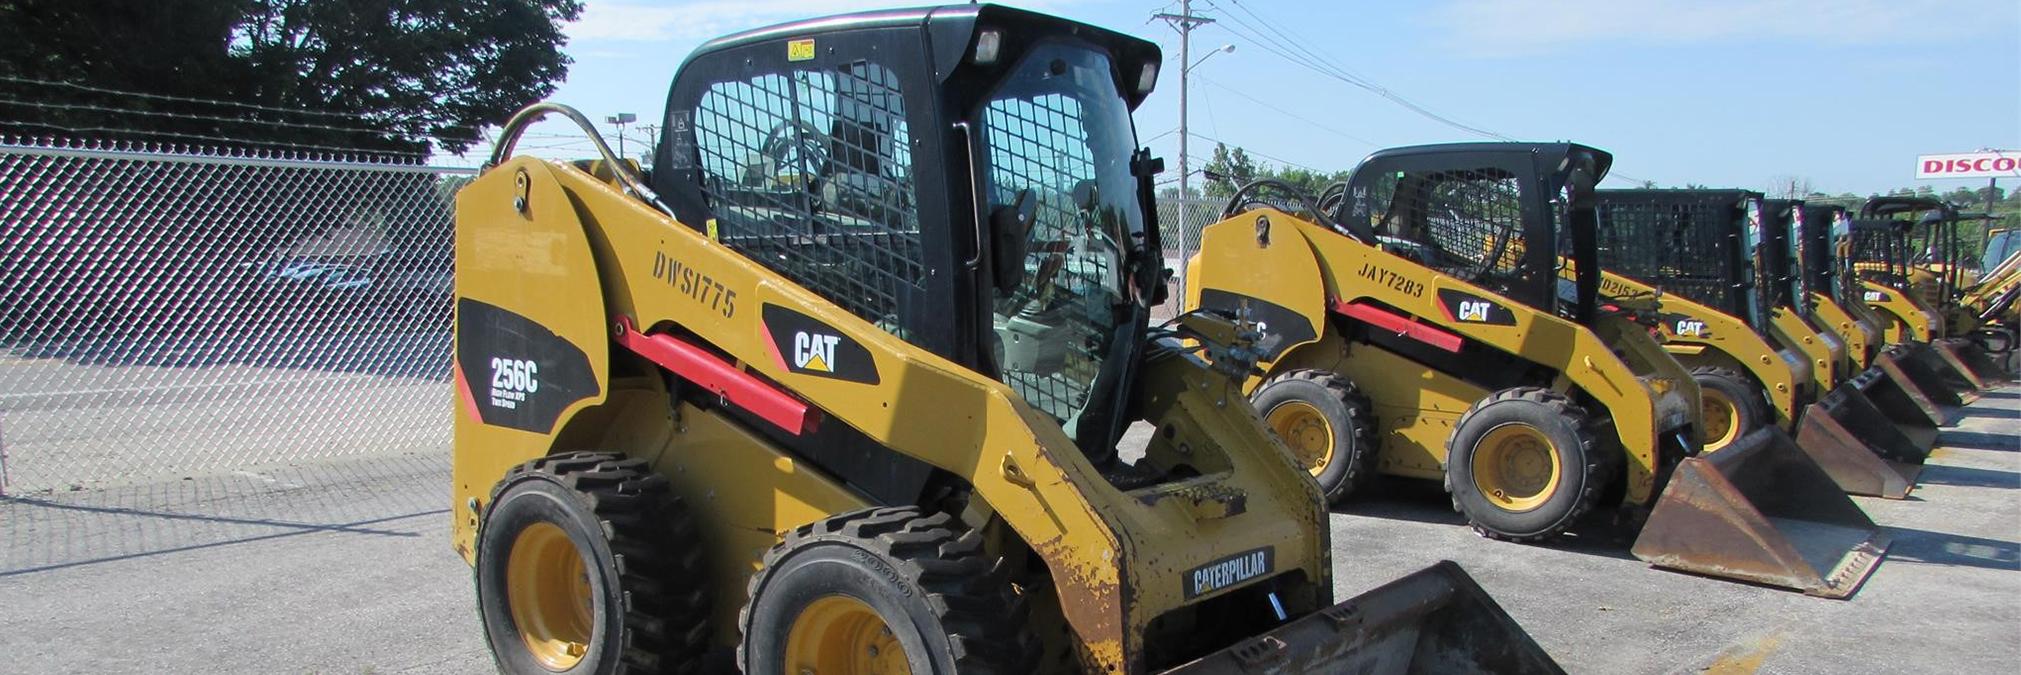 Haydon Equipment Sales | Equipment Sales & Rental Company